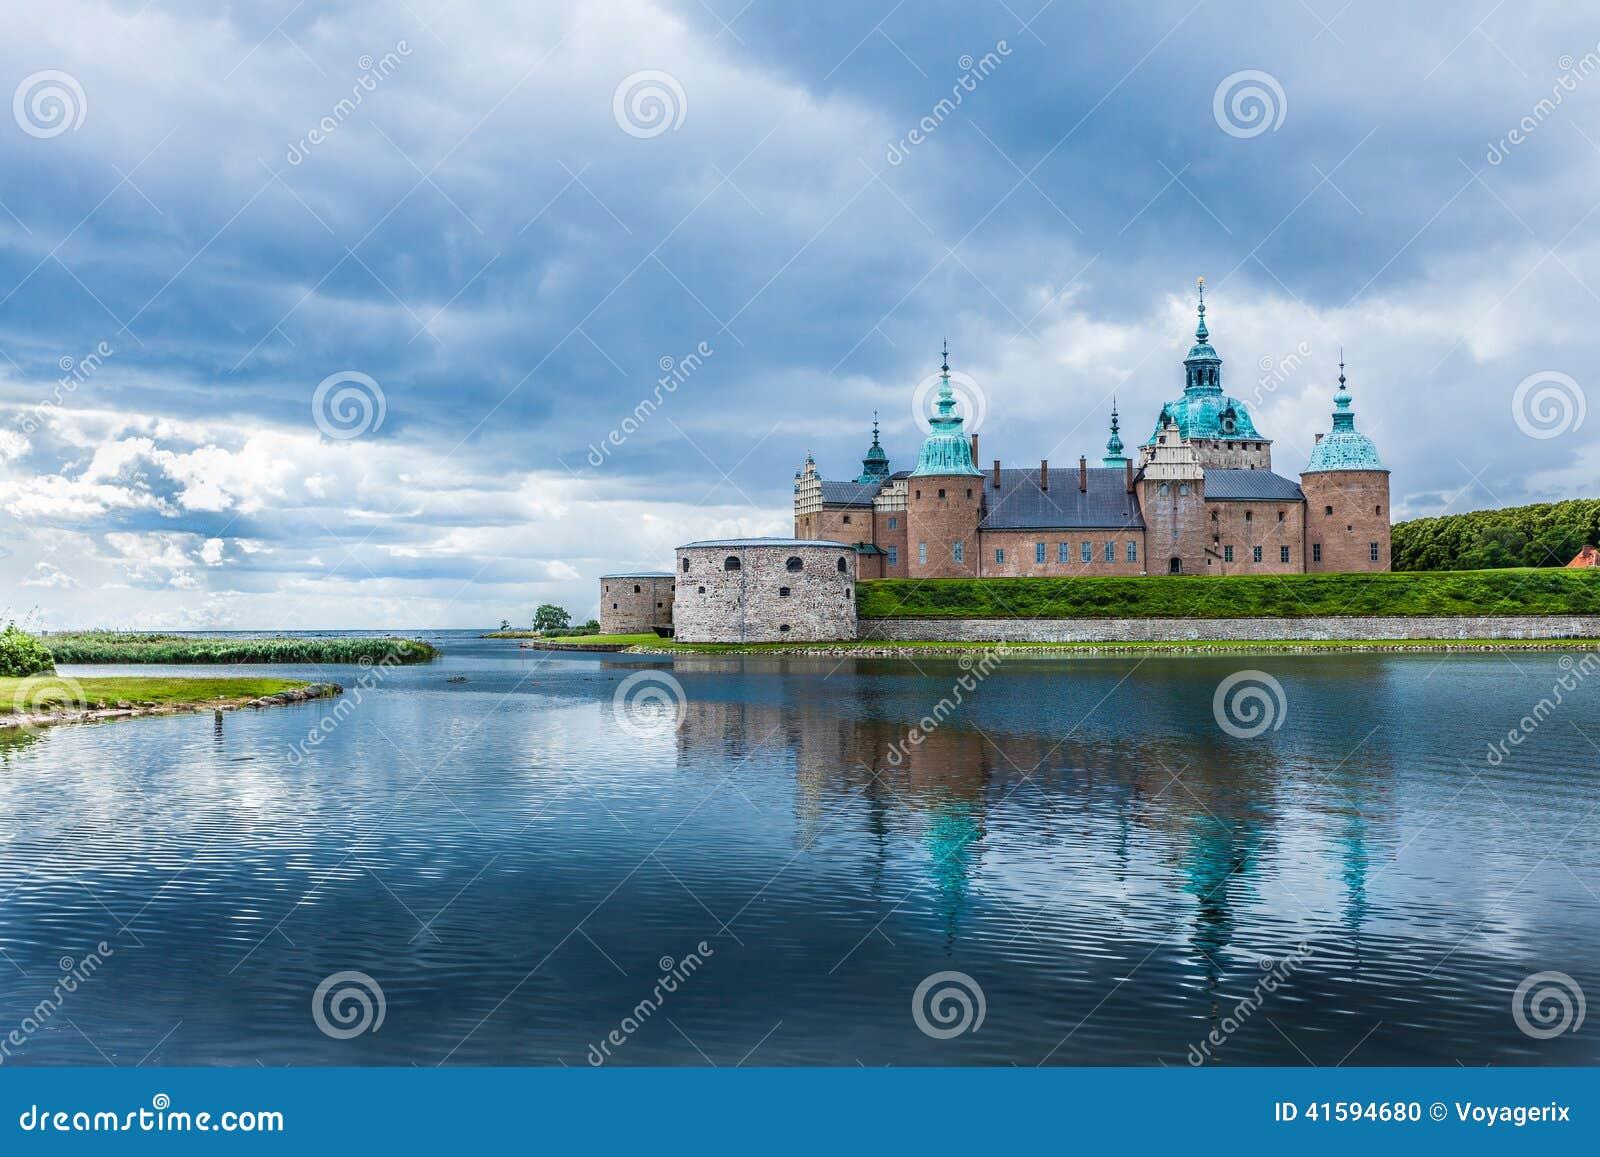 Castello storico di Kalmar in Svezia Scandinavia Europa limite